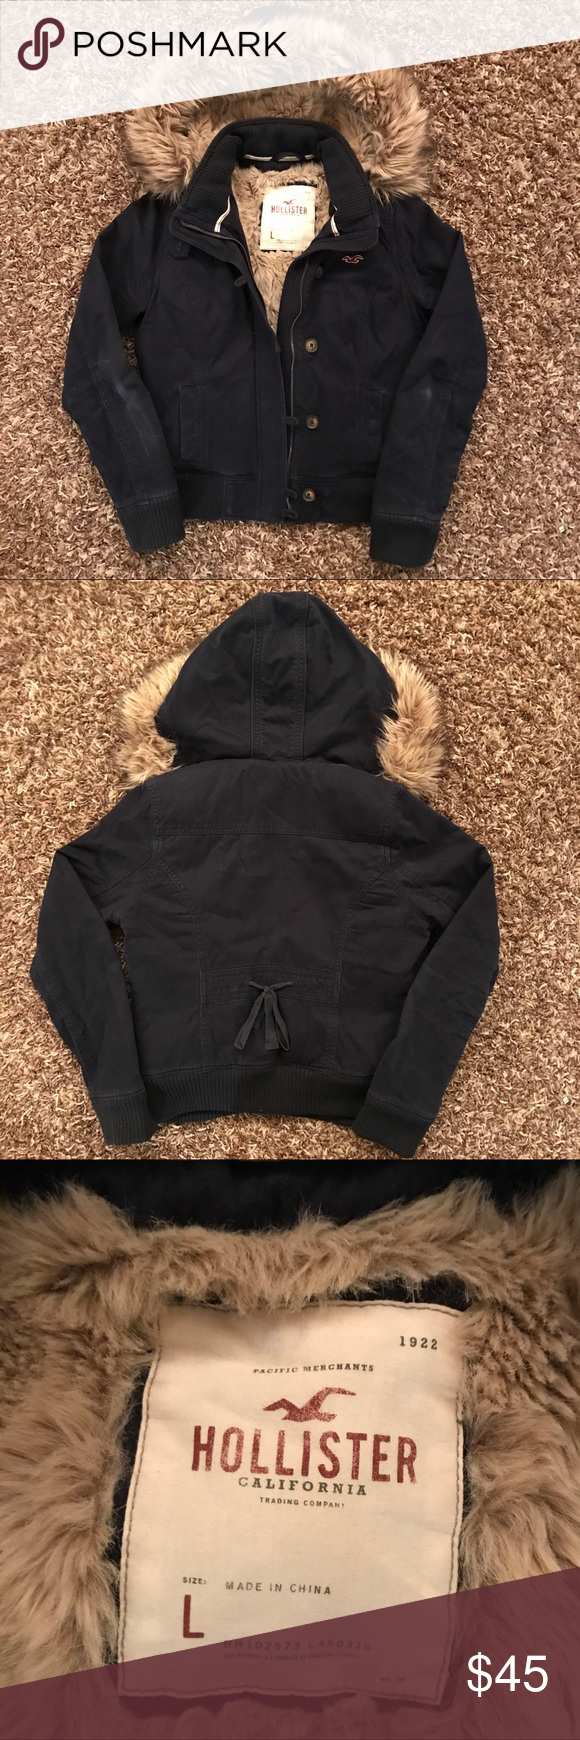 Hollister Winter Jacket Navy And Fuzzy Fashion Clothes Design Fashion Design [ 1740 x 580 Pixel ]